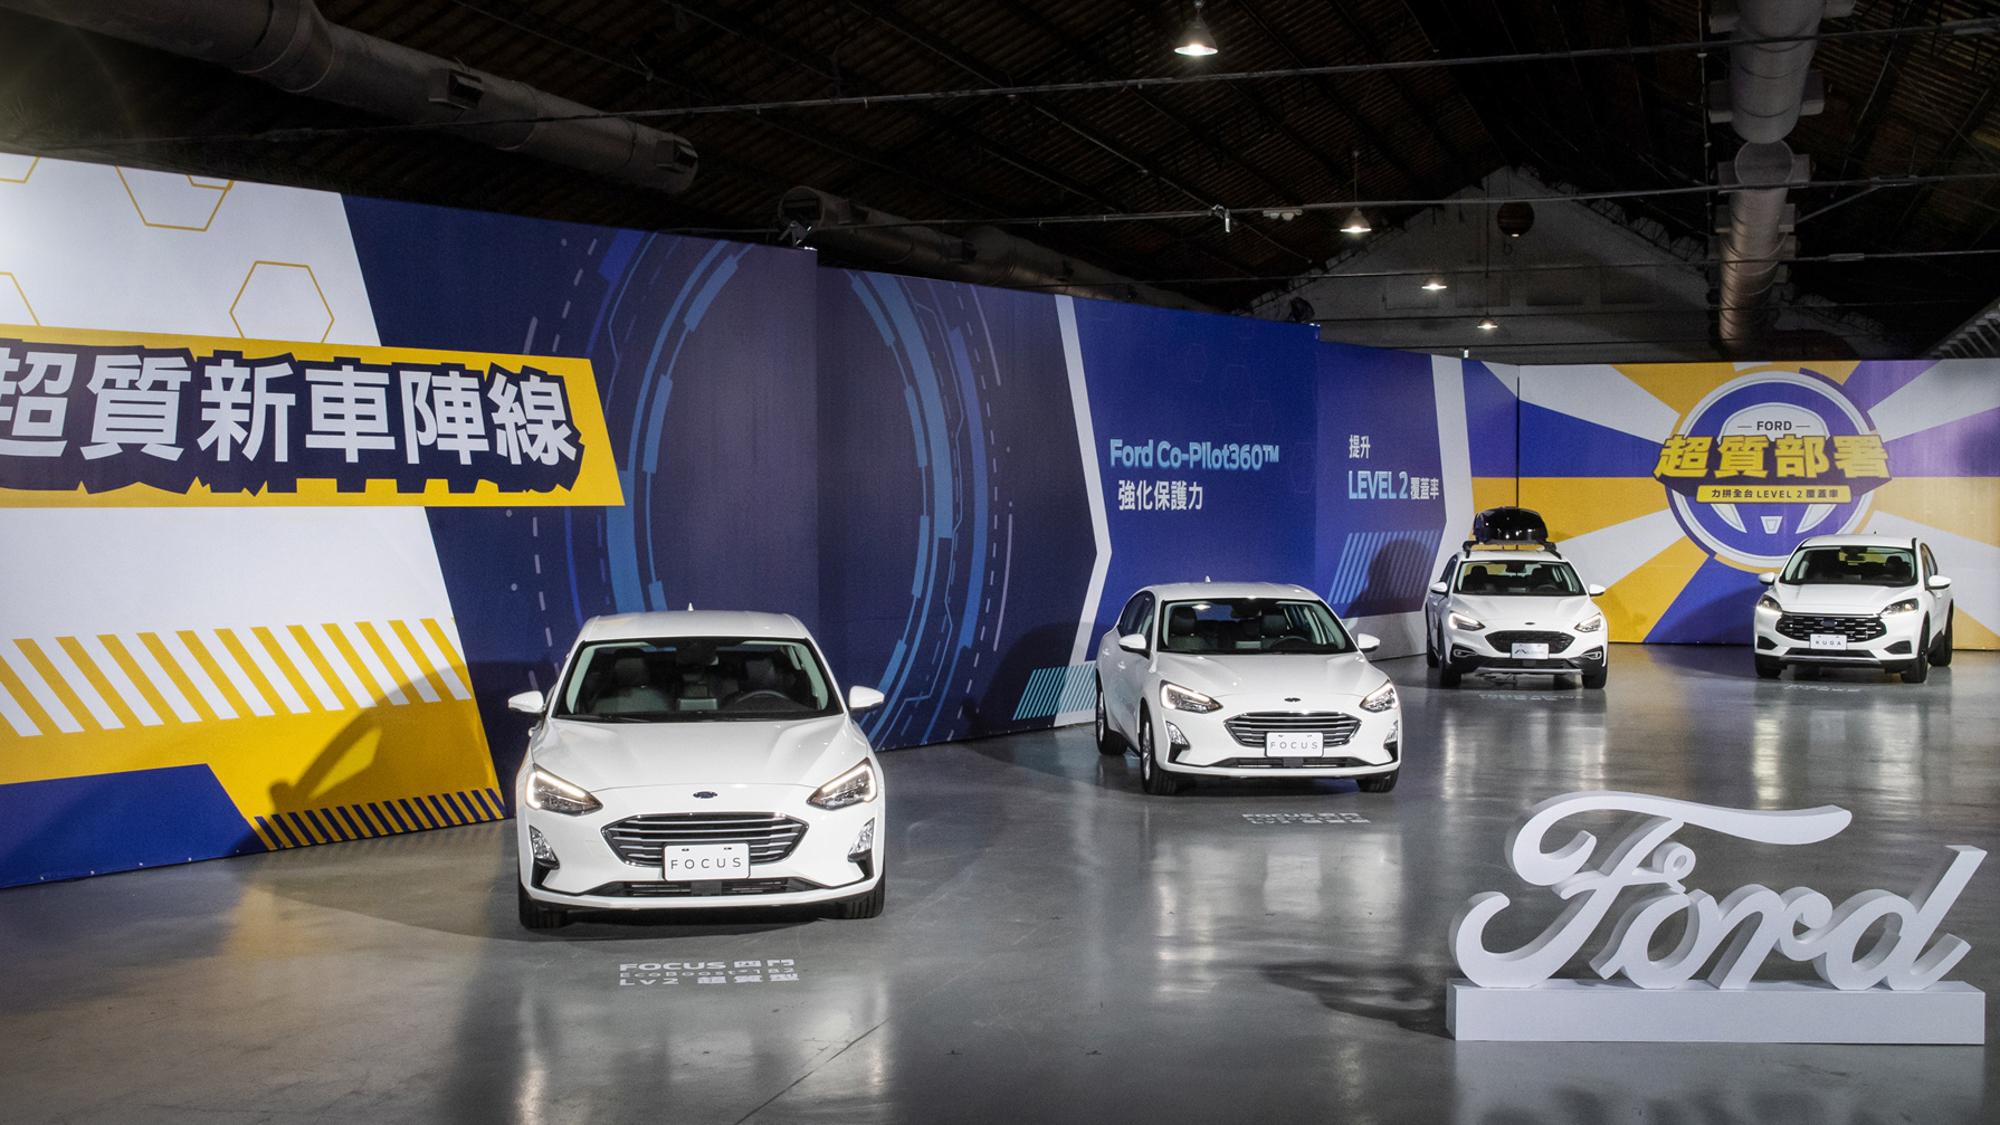 Ford Focus / Kuga 超質型車系推出!主打 Level 2 輔助科技力拼安全「超值」